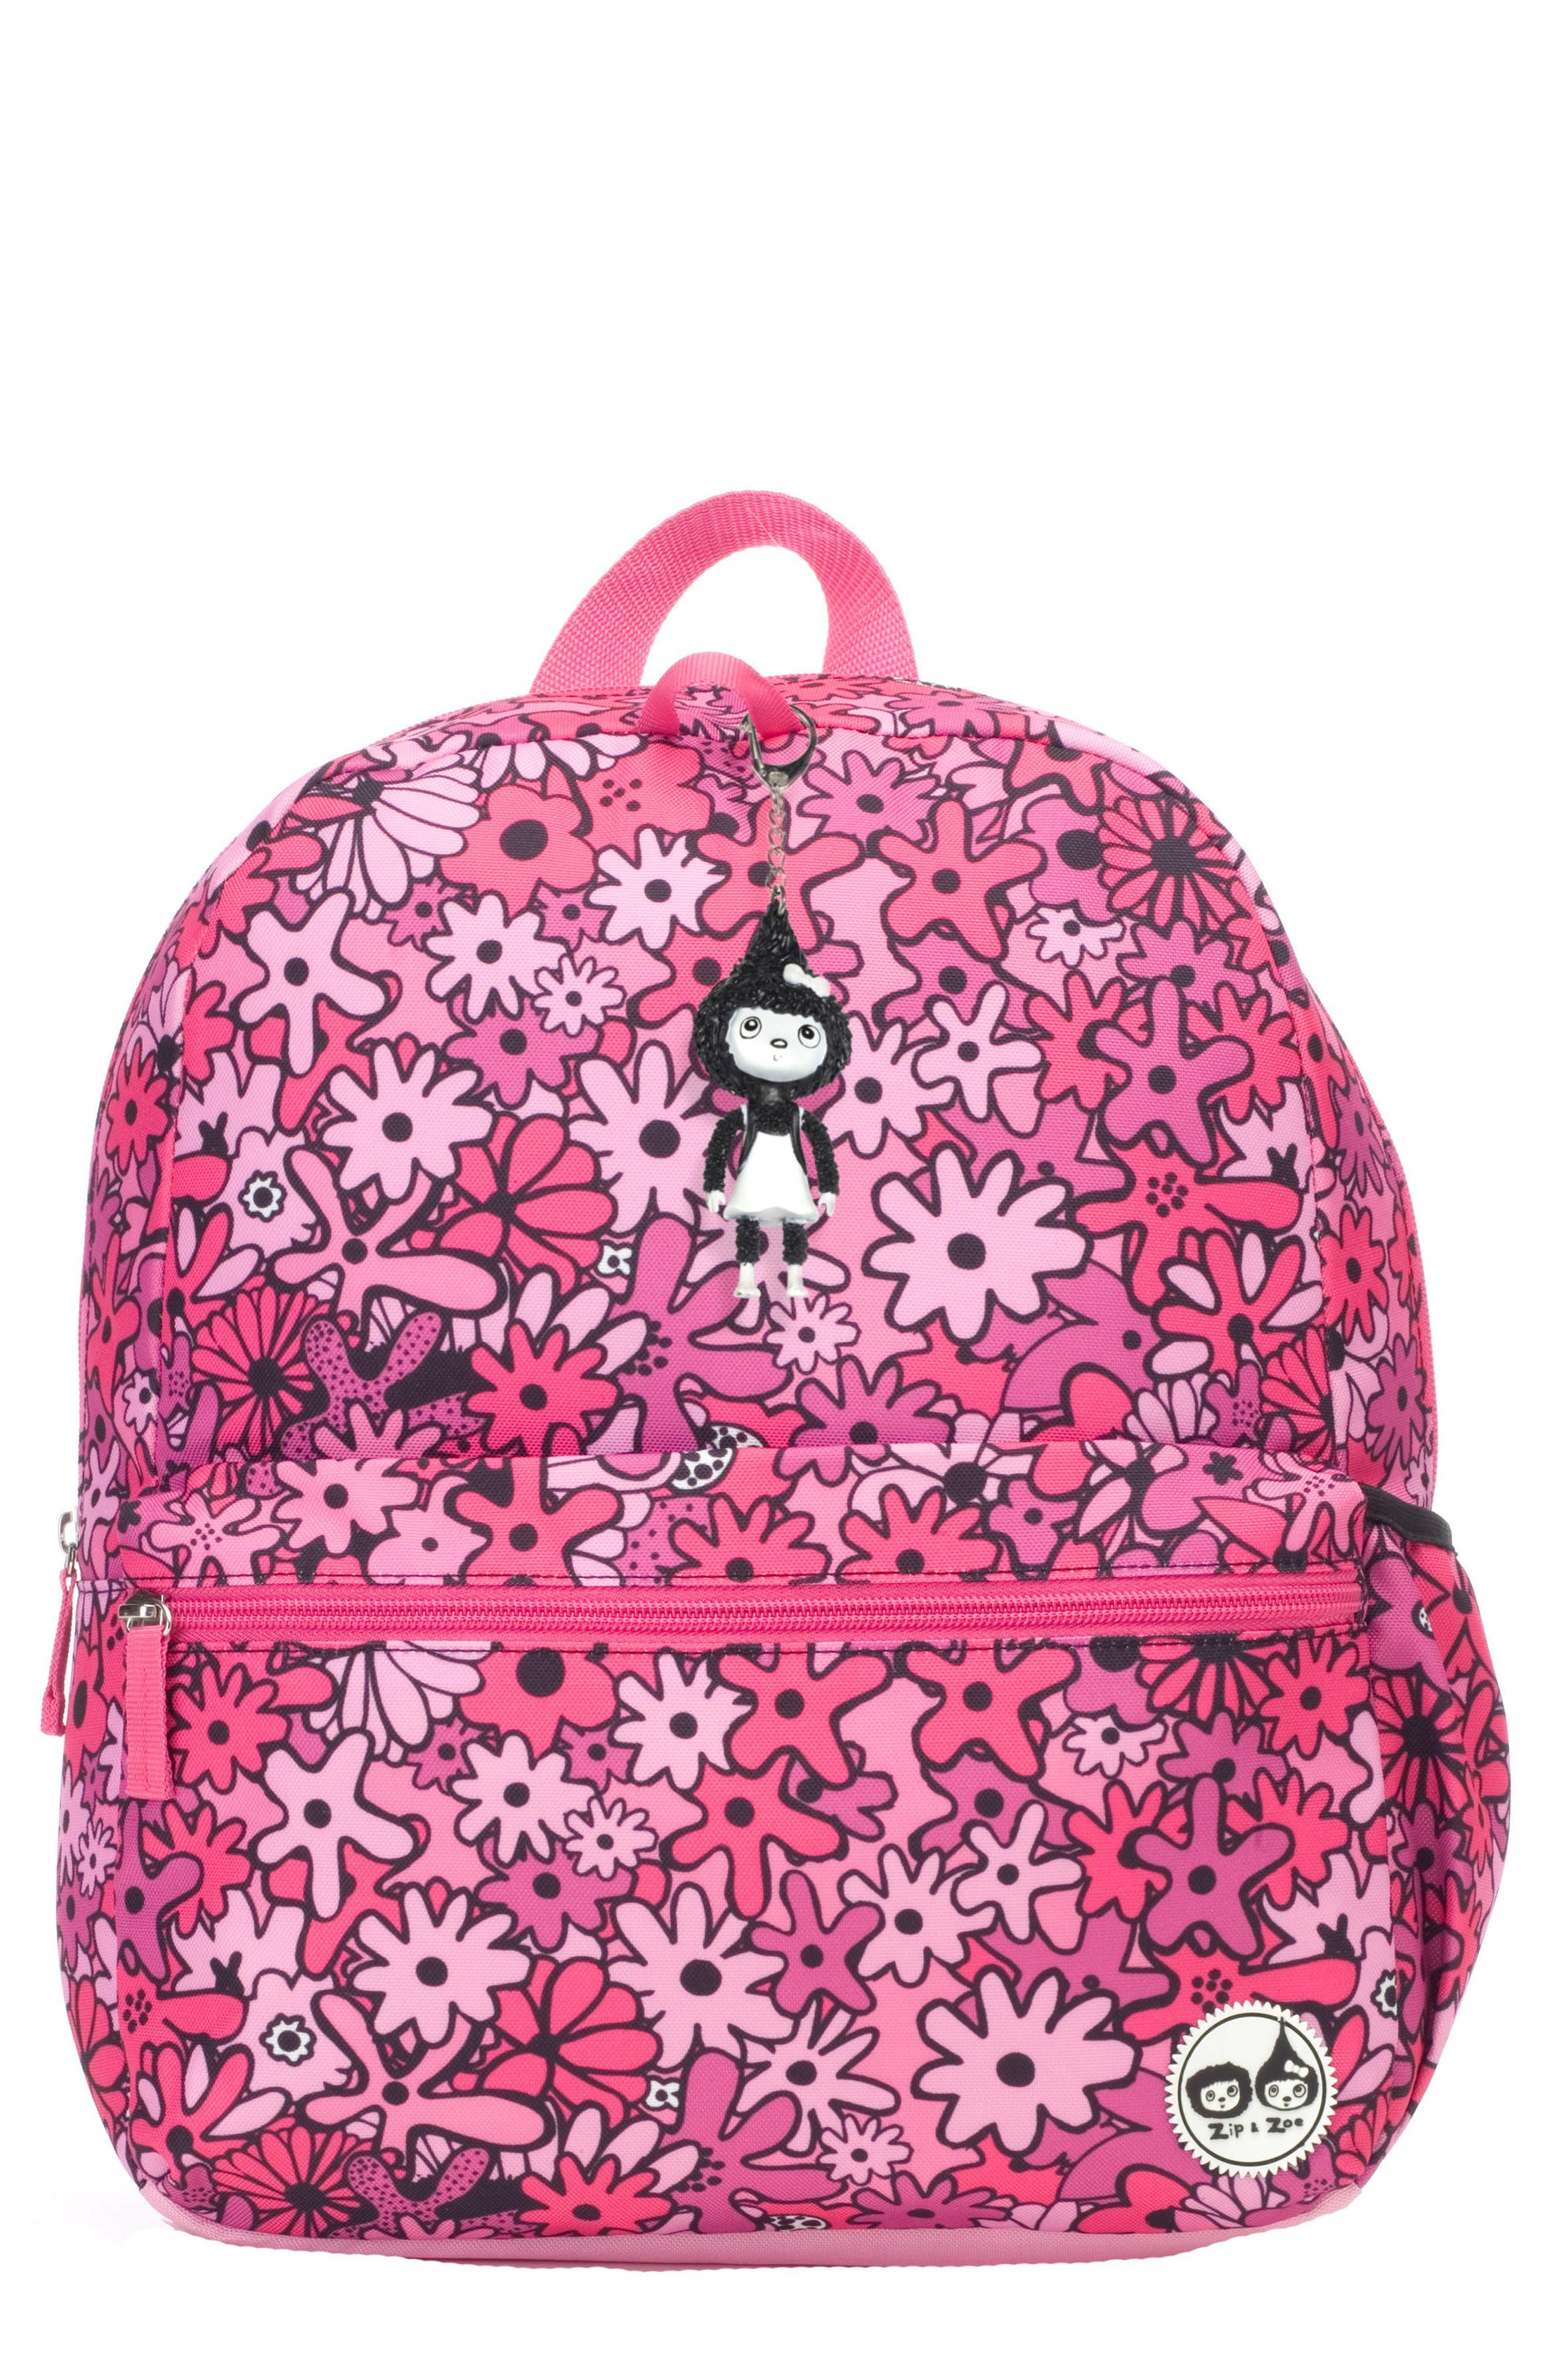 BABYMEL Zip & Zoe Floral Junior Backpack, Main, color, 650